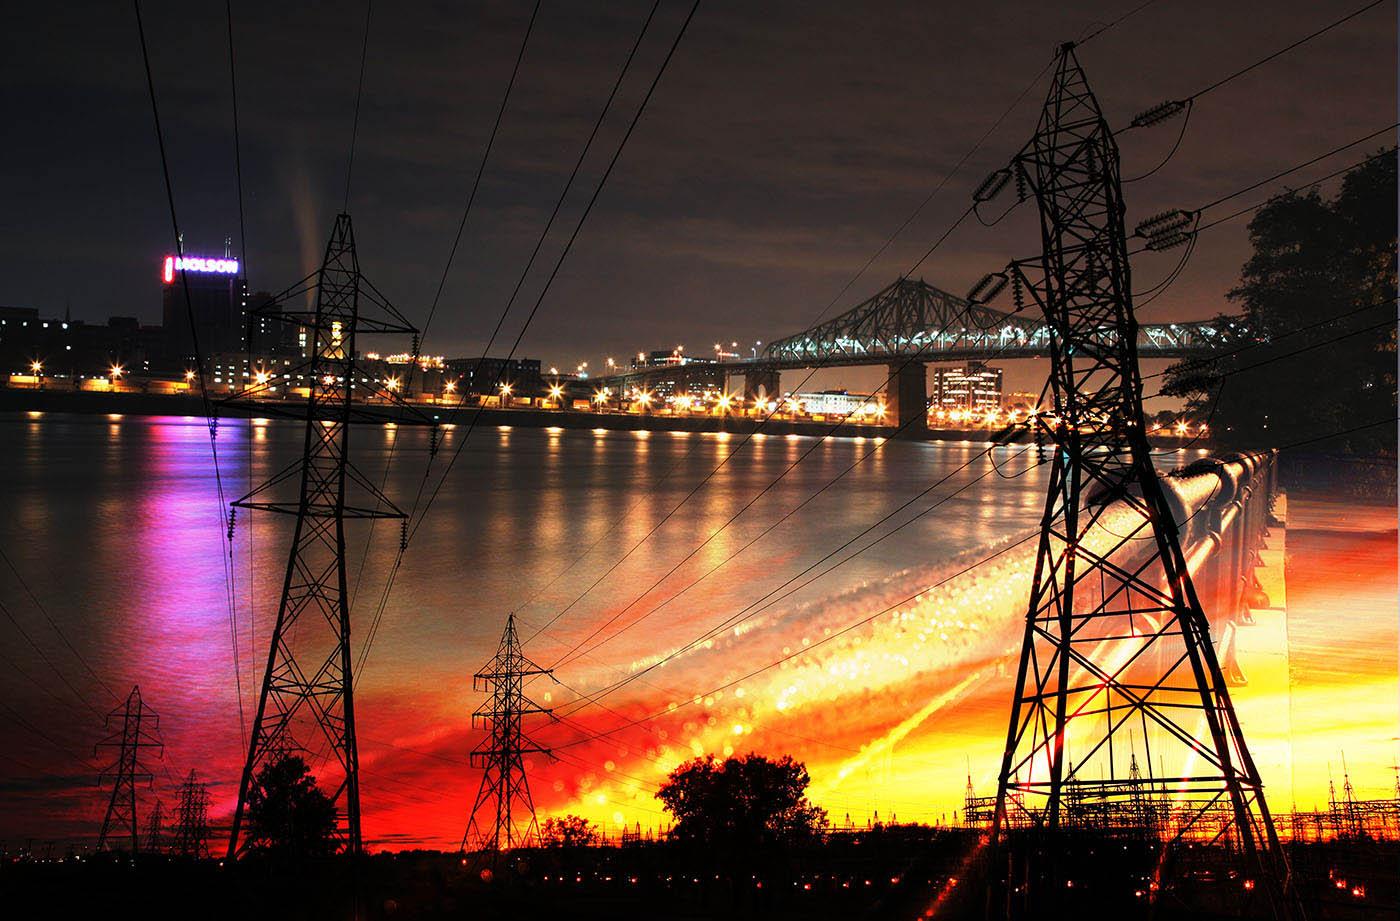 Urban Electrification - Dimensions: 5520 by 3632 pixels